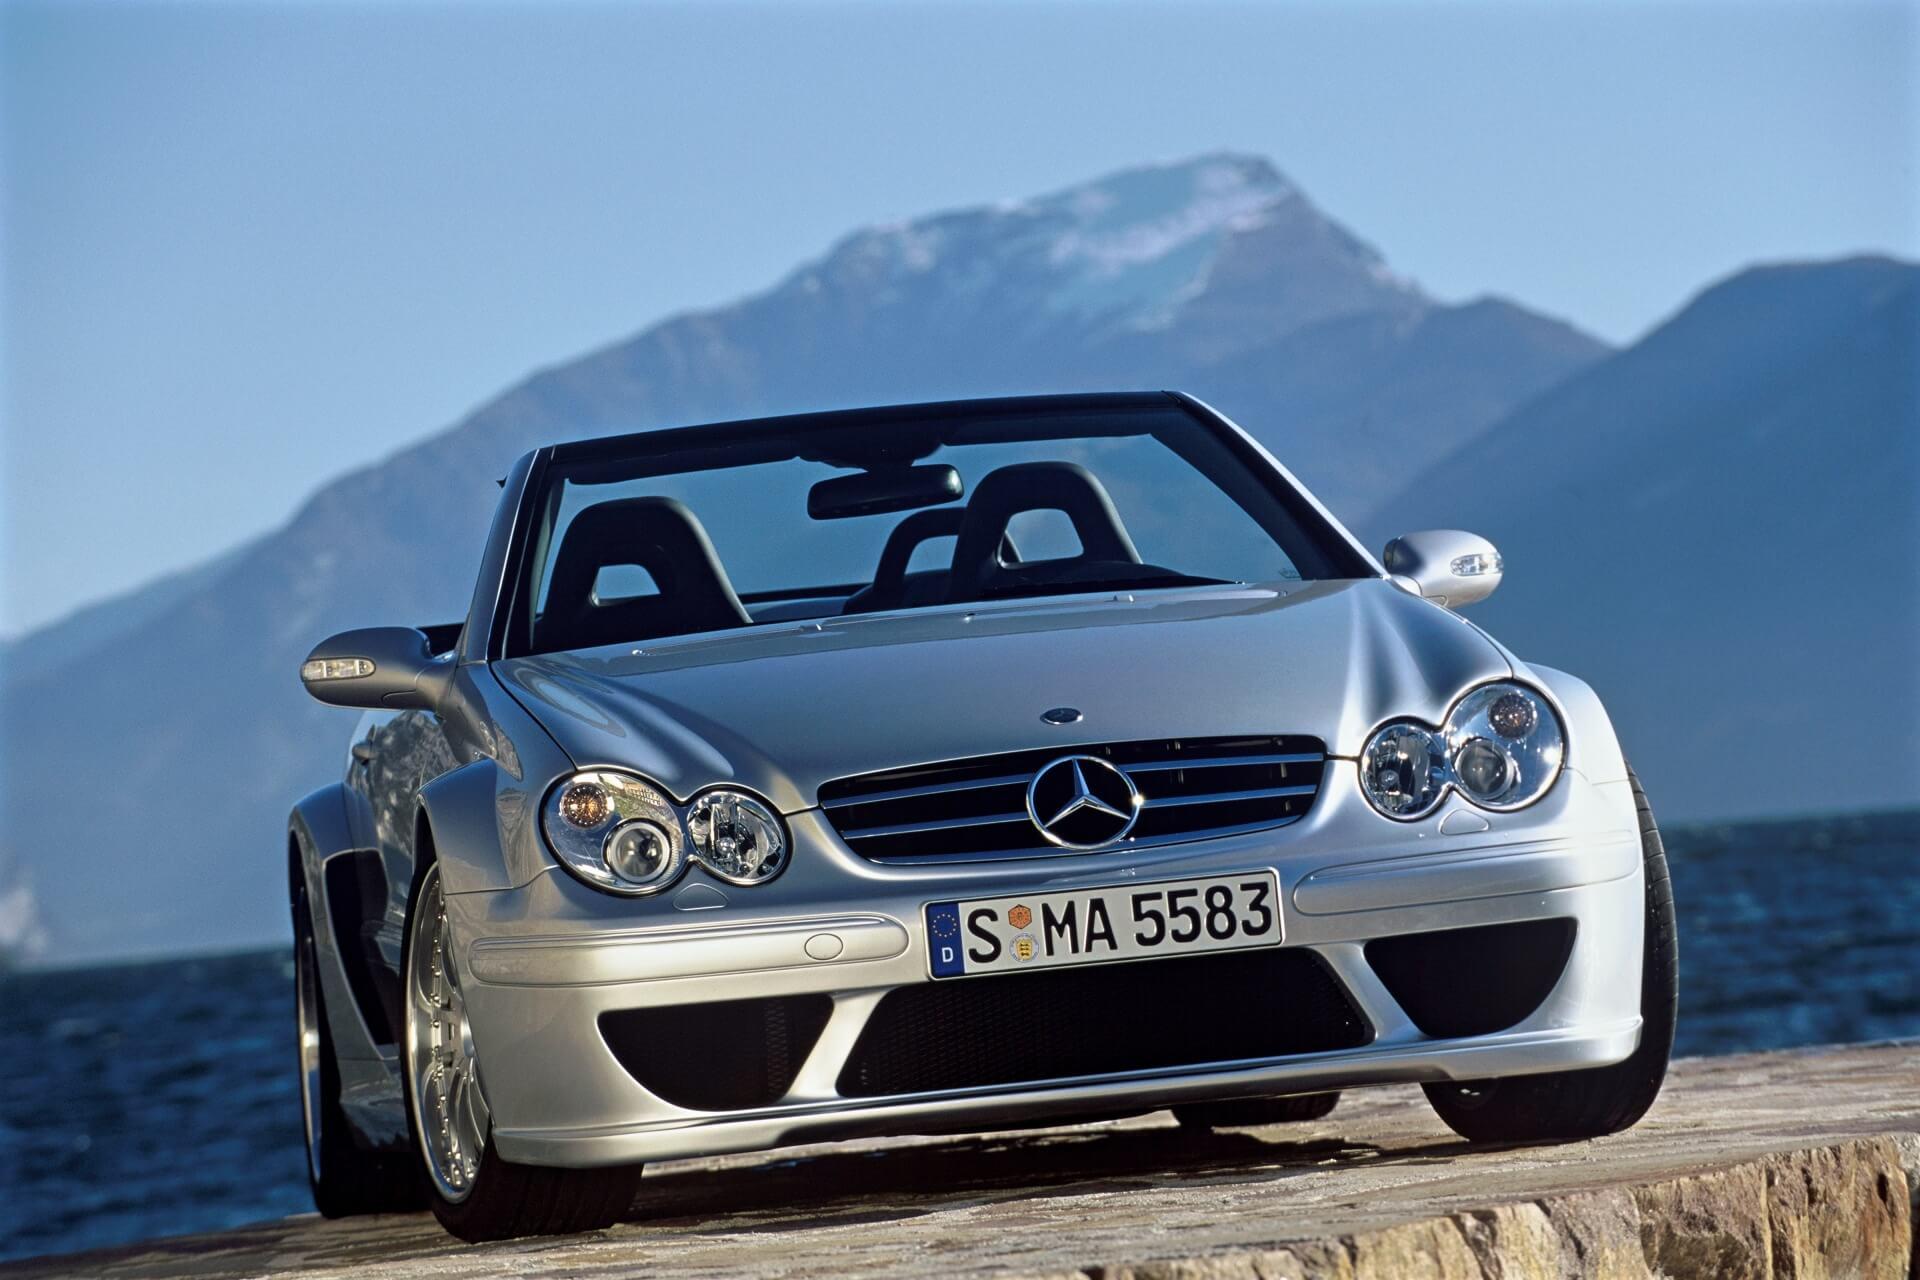 Mercedes-Benz CLK DTM AMG Cabriolet (C 209). Foto aus dem Jahr 2006.